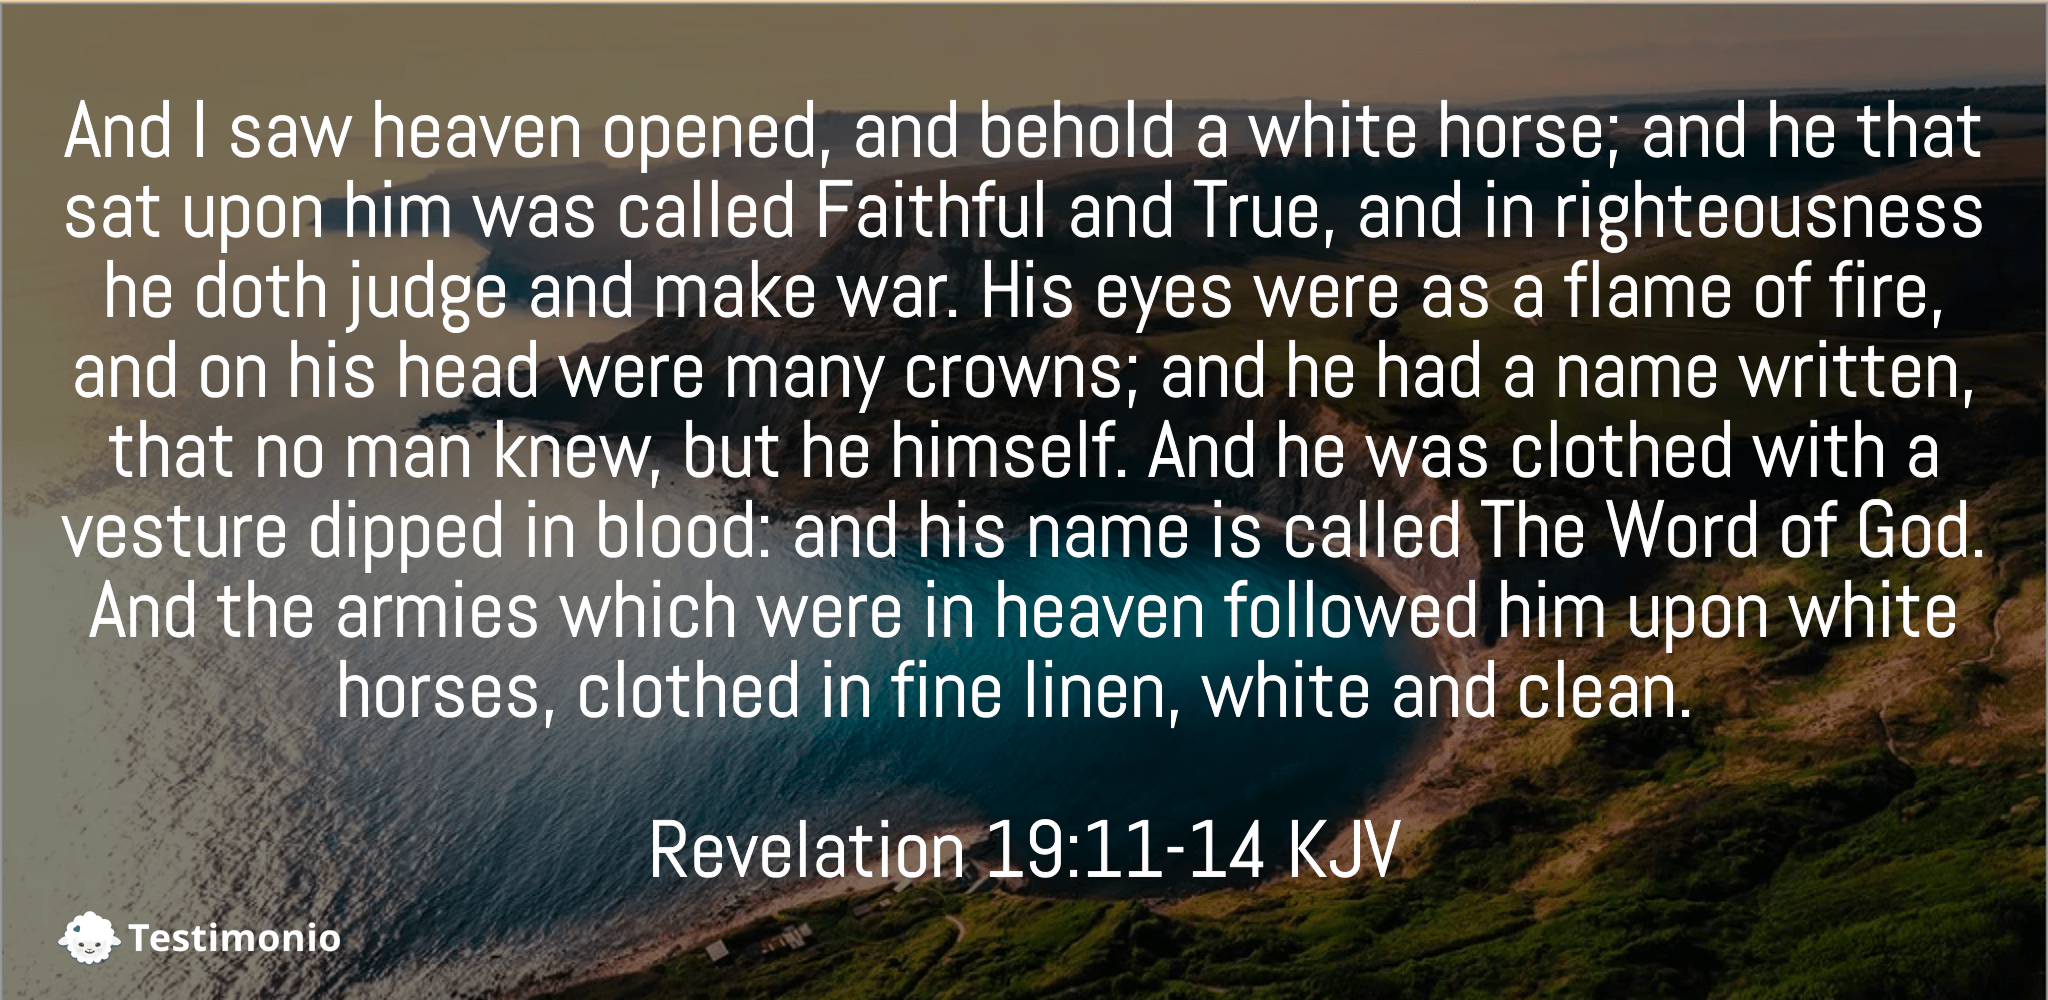 Revelation 19:11-14